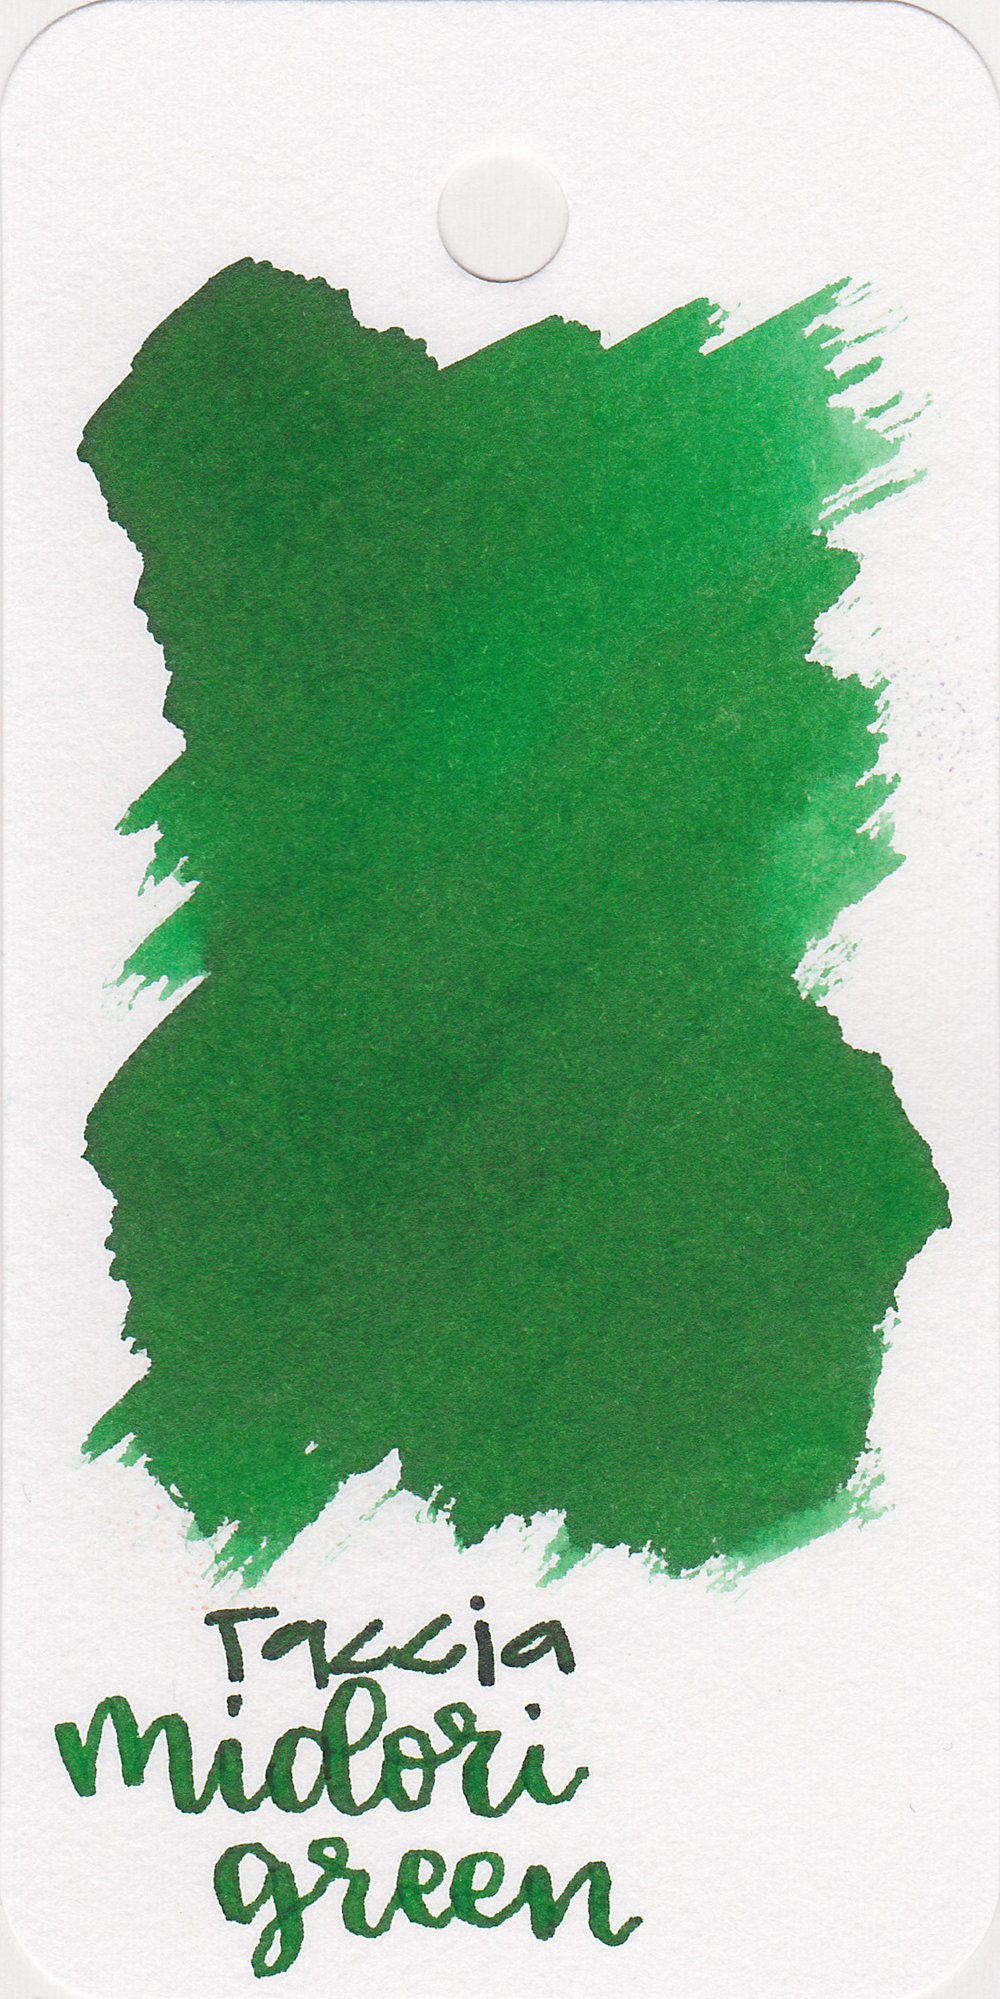 tac-midori-green-1.jpg